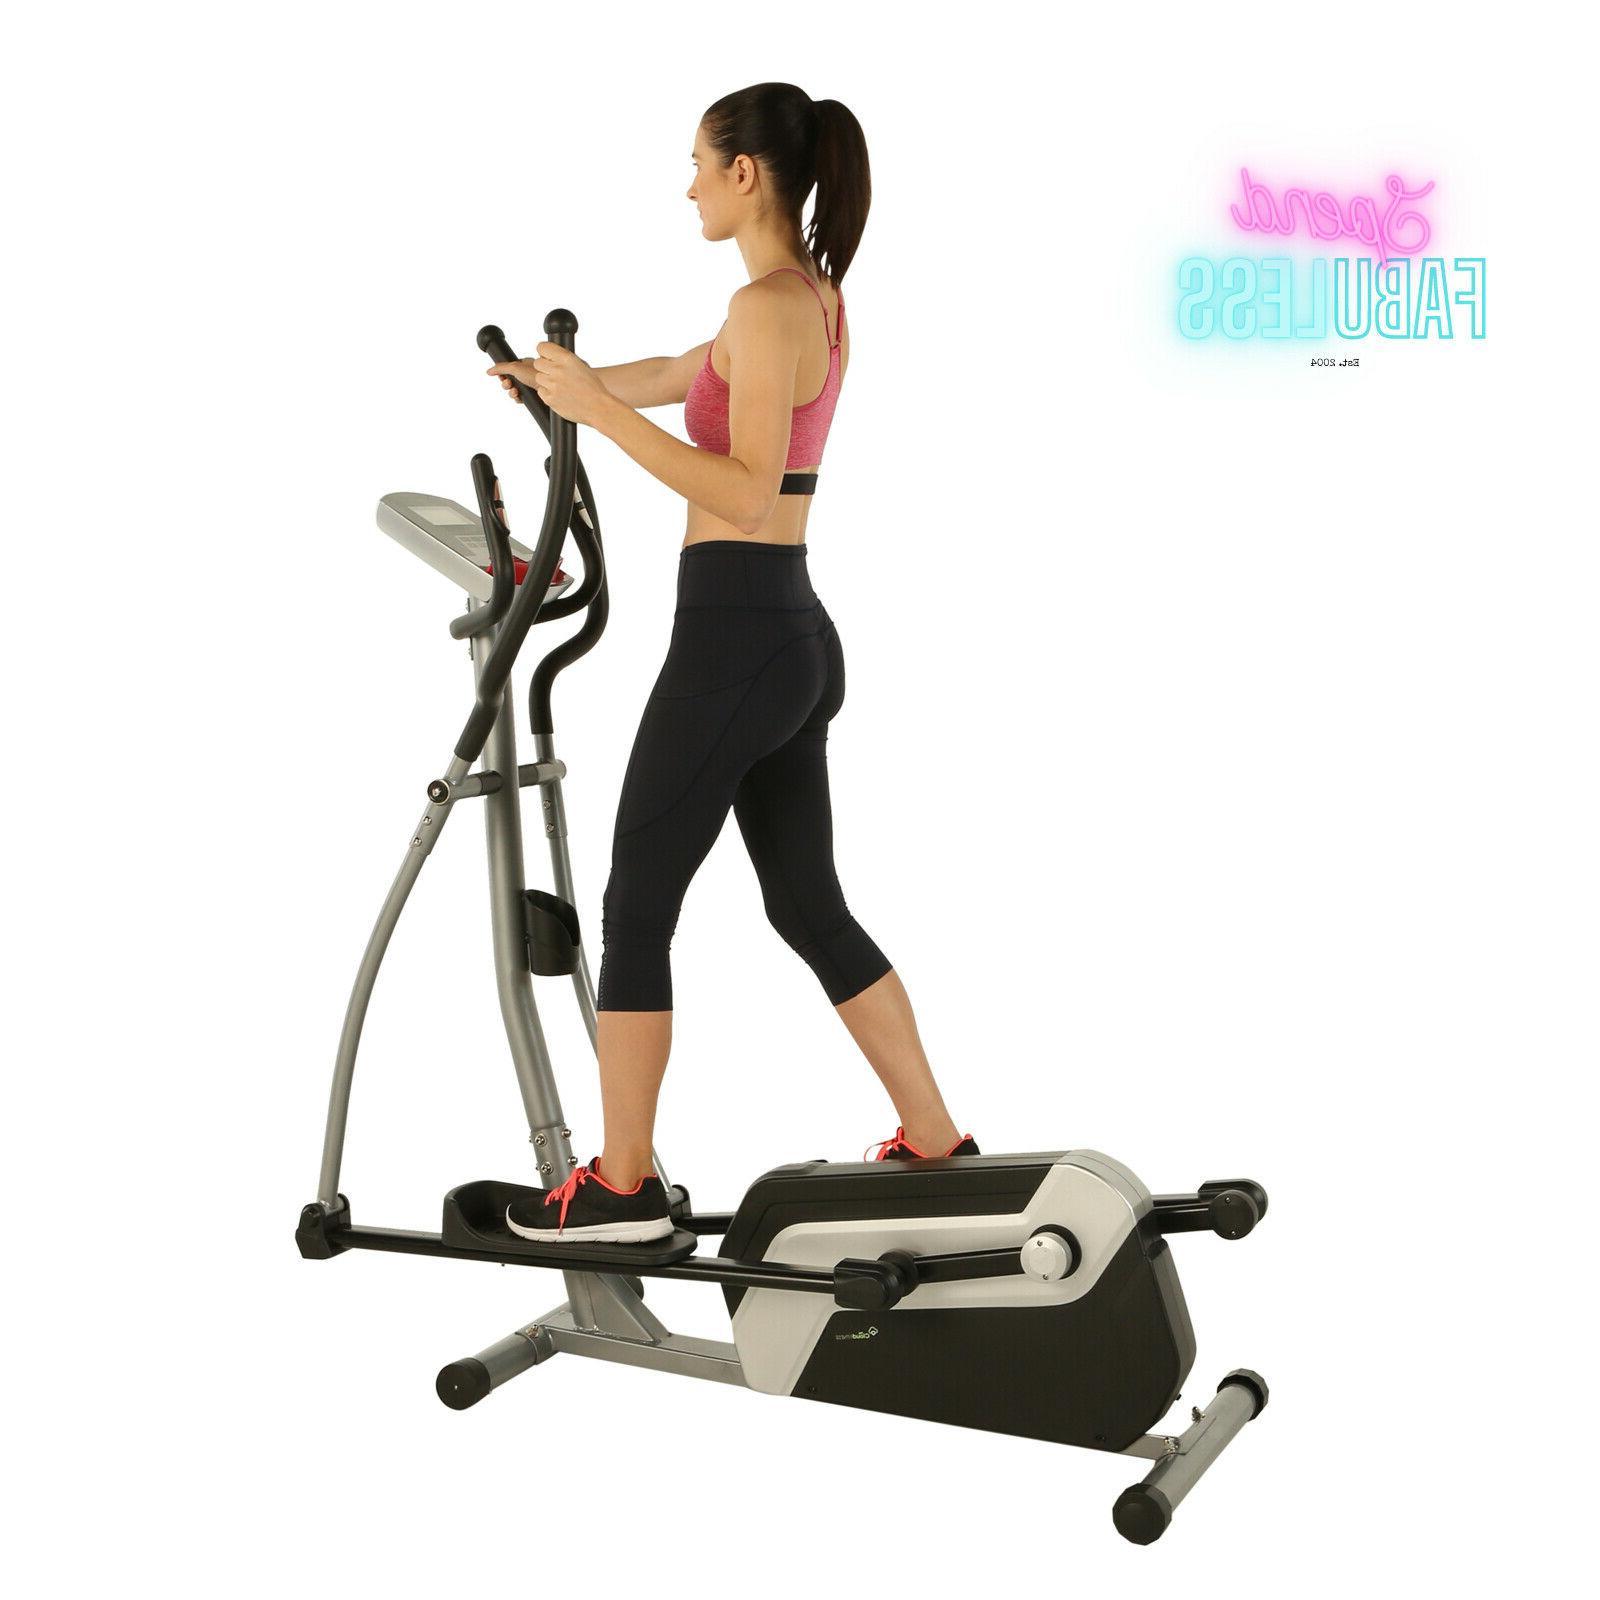 Bluetooth Elliptical Exercise Machine